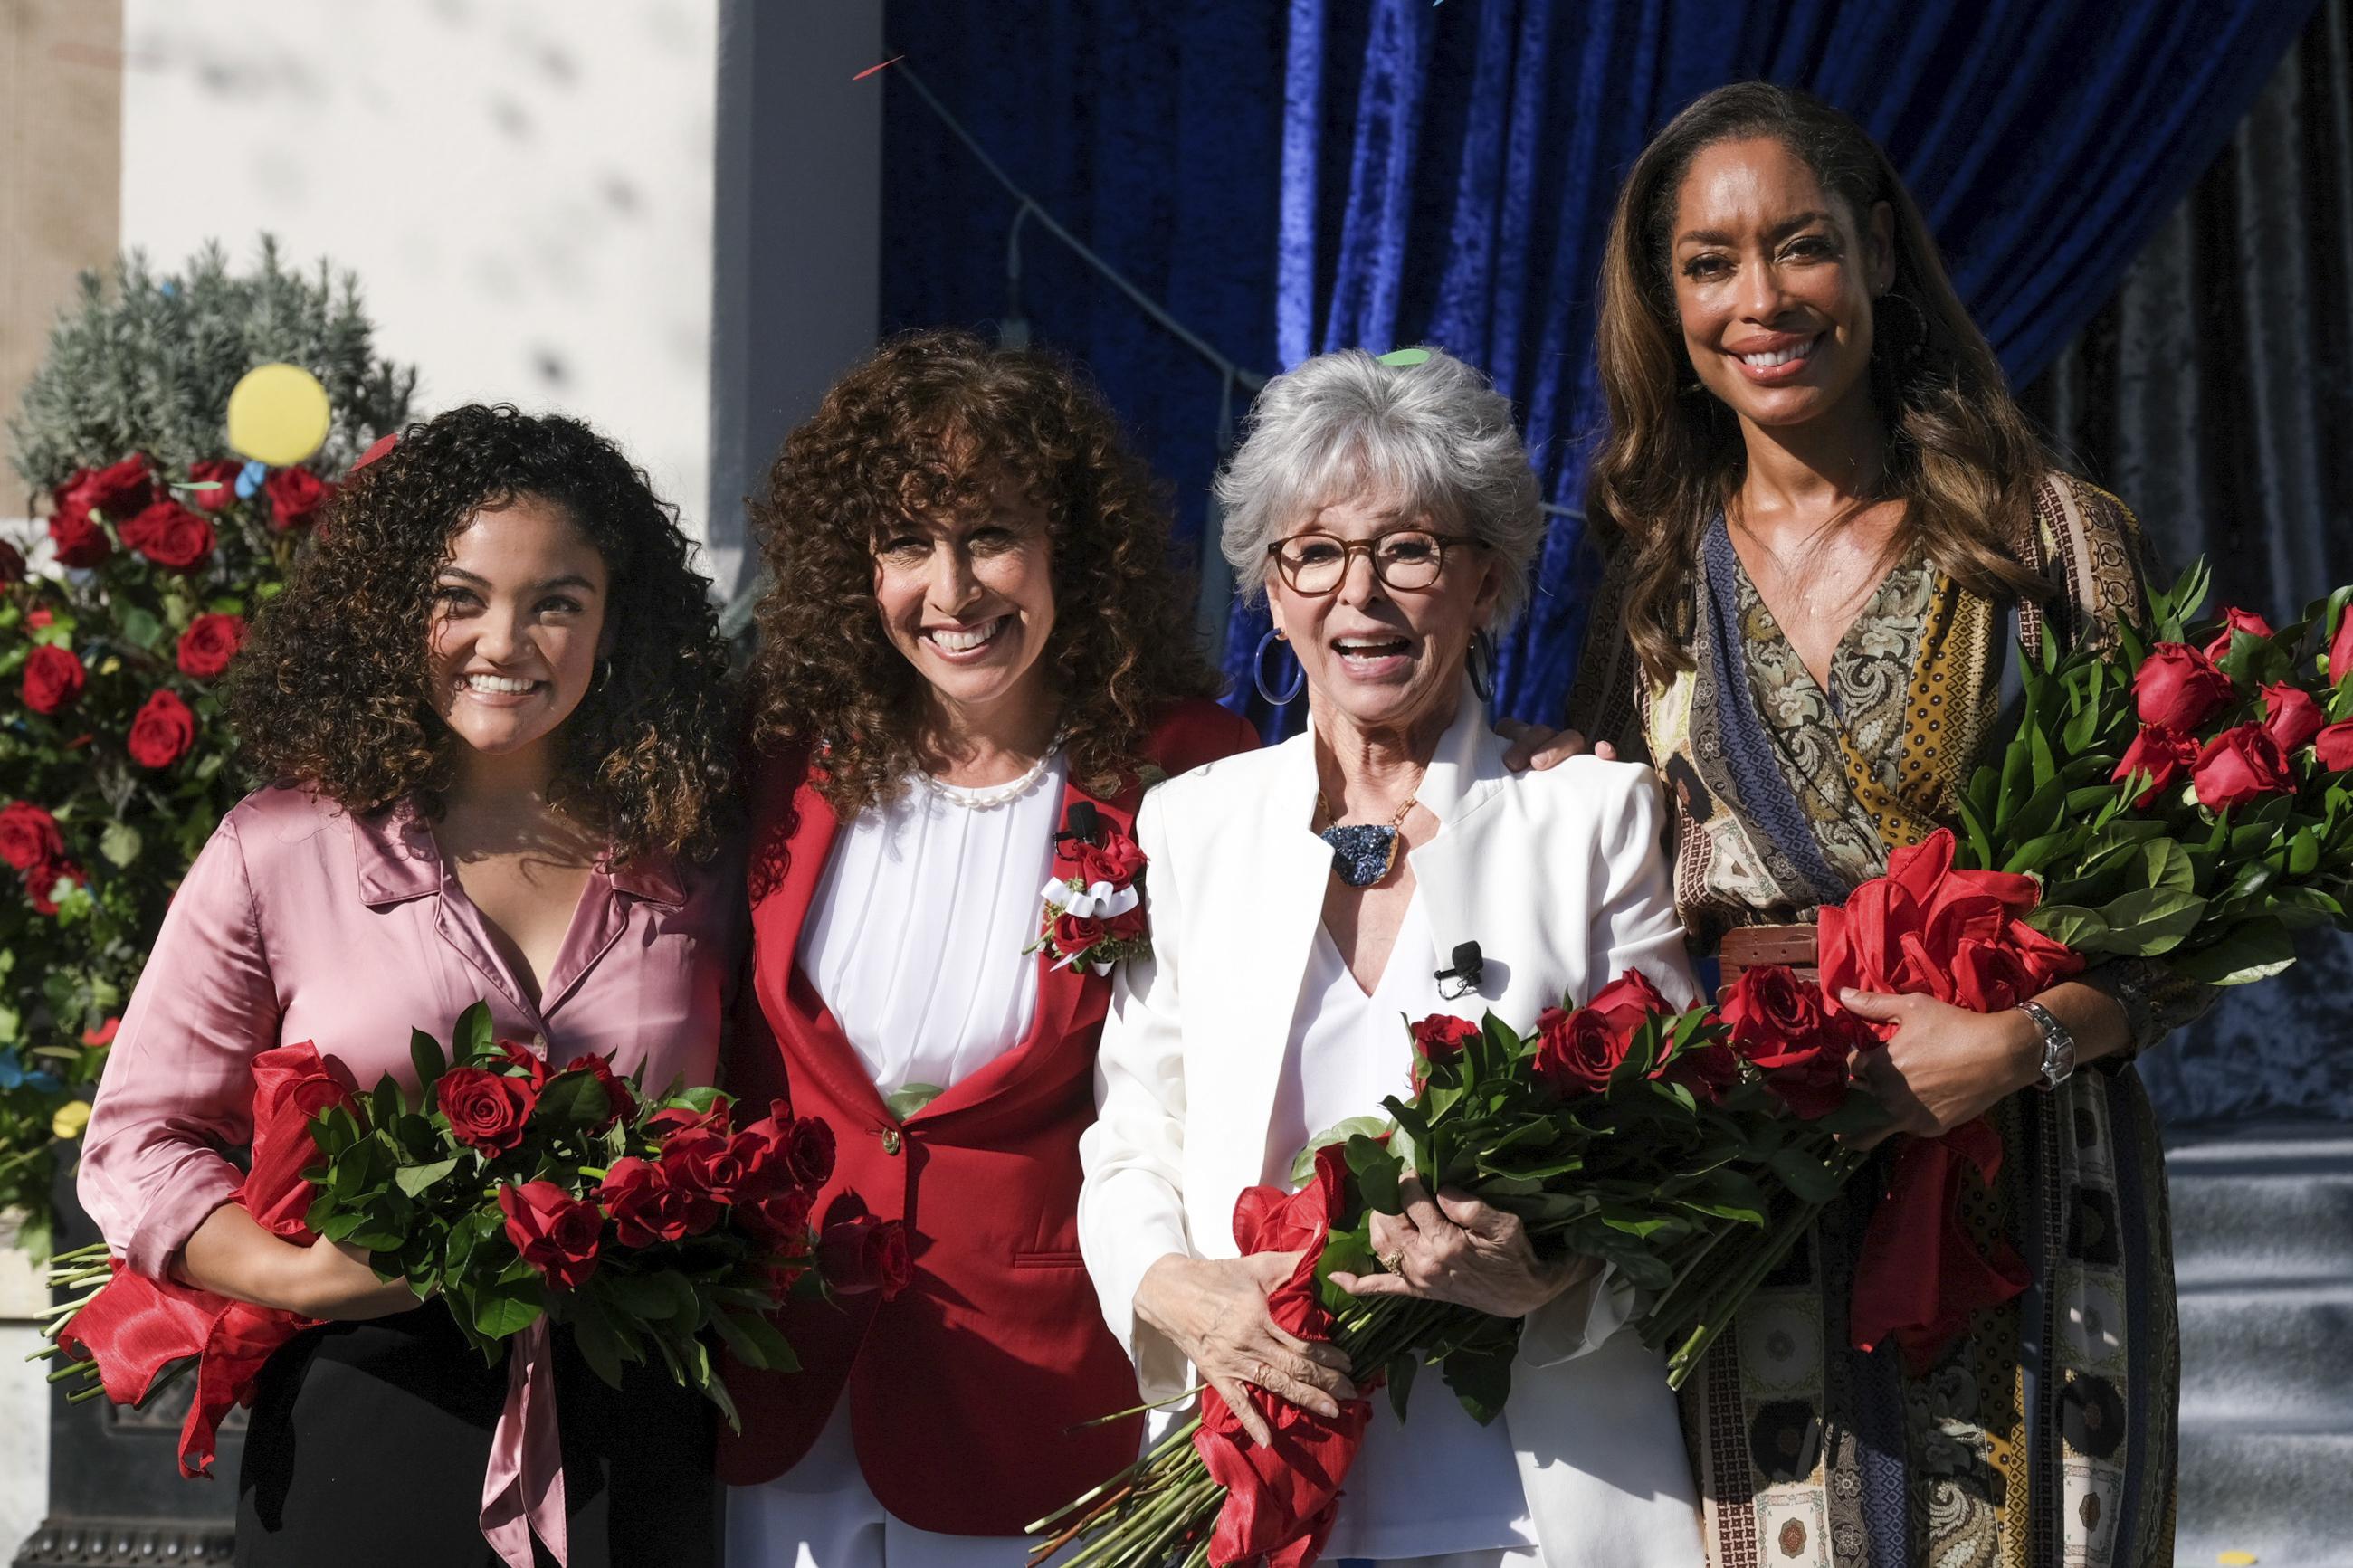 Actresses, gymnast named grand marshals of 2020 Rose Parade